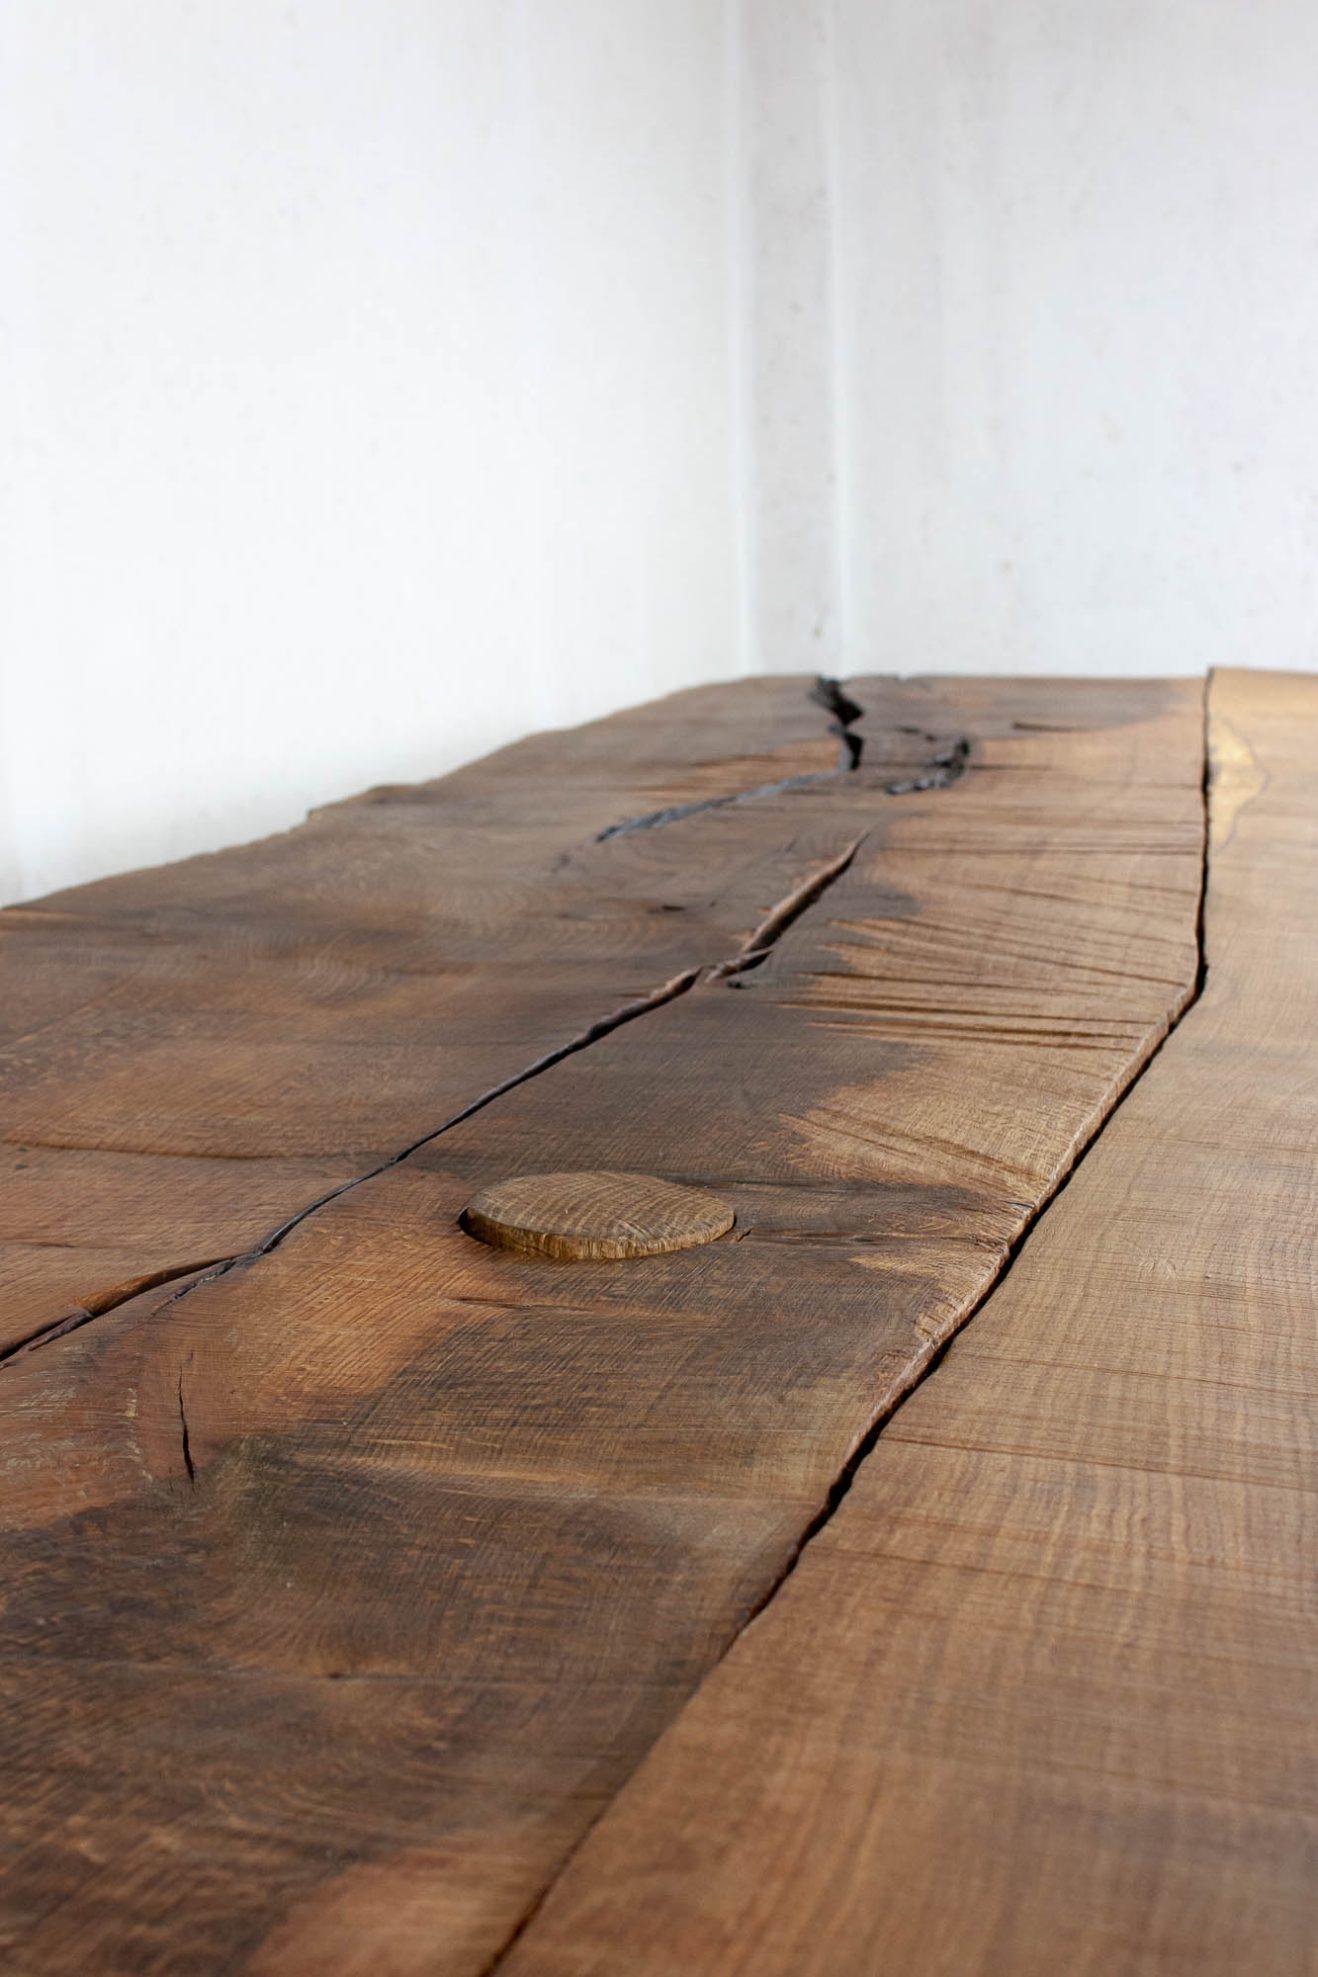 Massive Table #1 by Soha Concept, Denis Milovanov 3